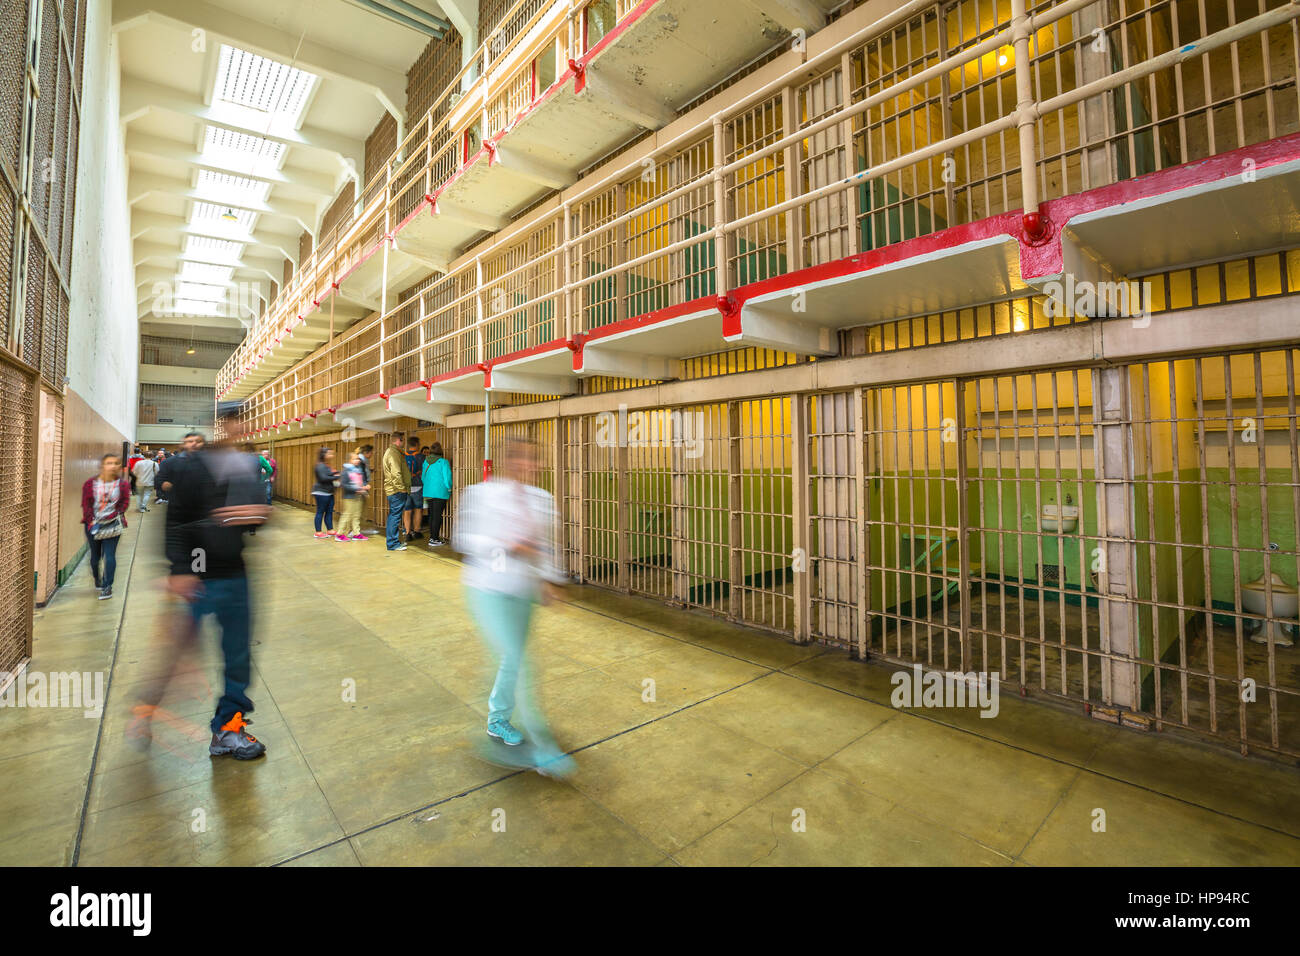 San Francisco, California, Estados Unidos - 14 de agosto de 2016: sala principal con tres filas de bloques de celdas Foto de stock